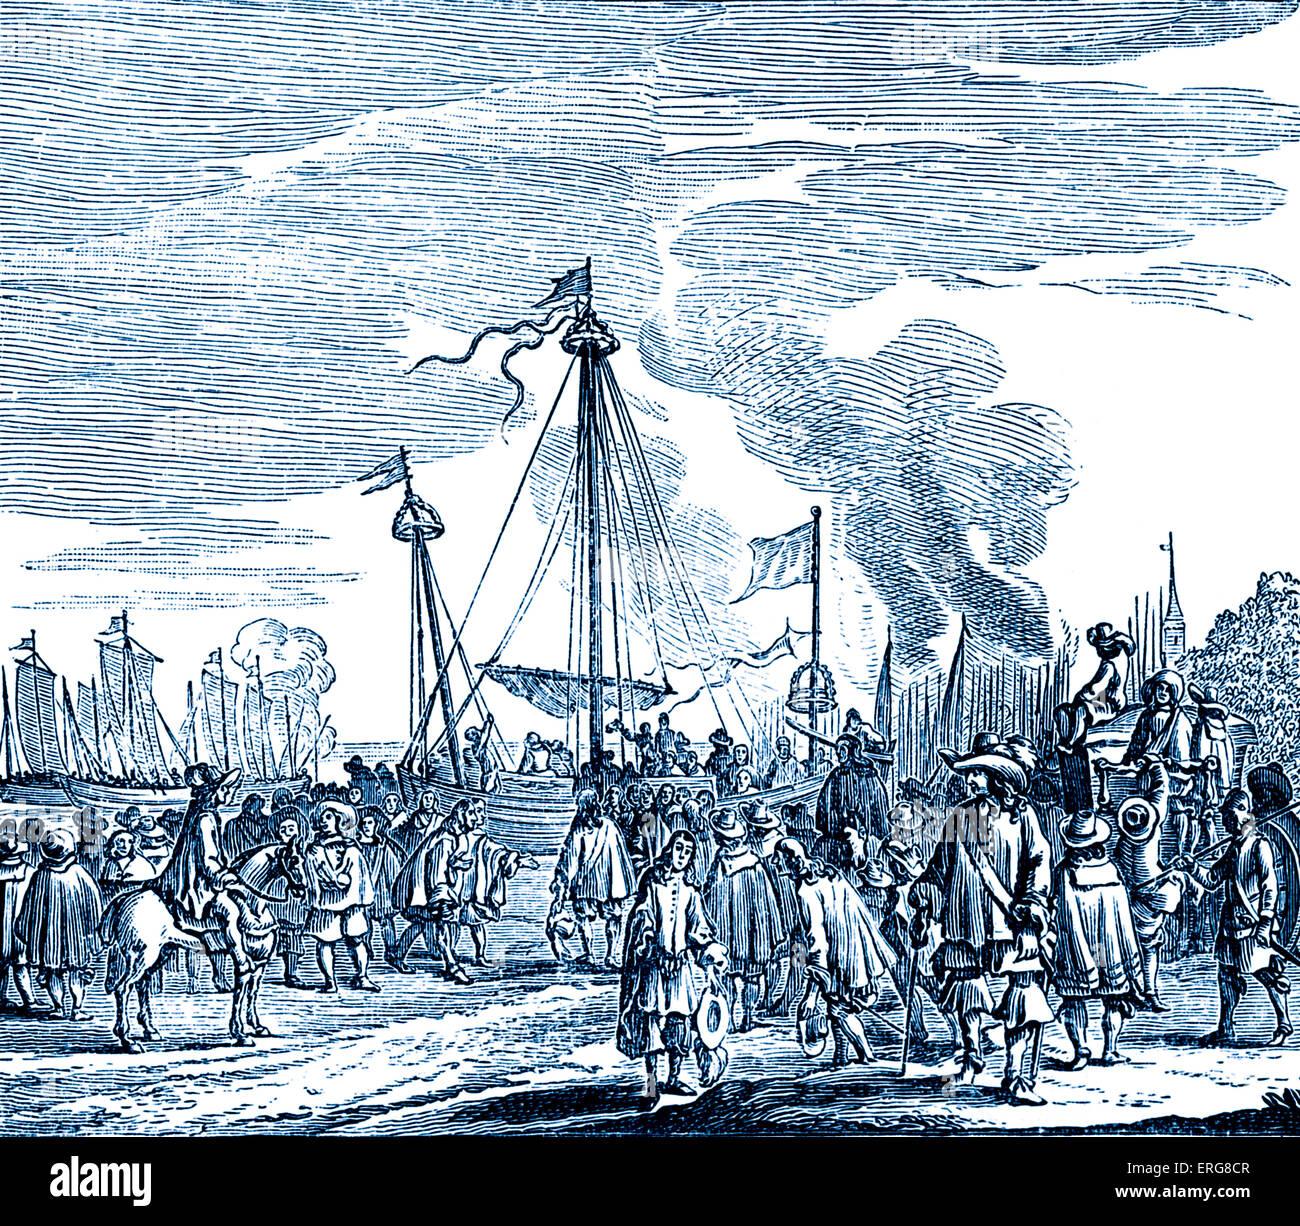 Charles II embarking for England, reproduced from the Koninklijke Beltenis van Karel II, published in 1660. Charles - Stock Image